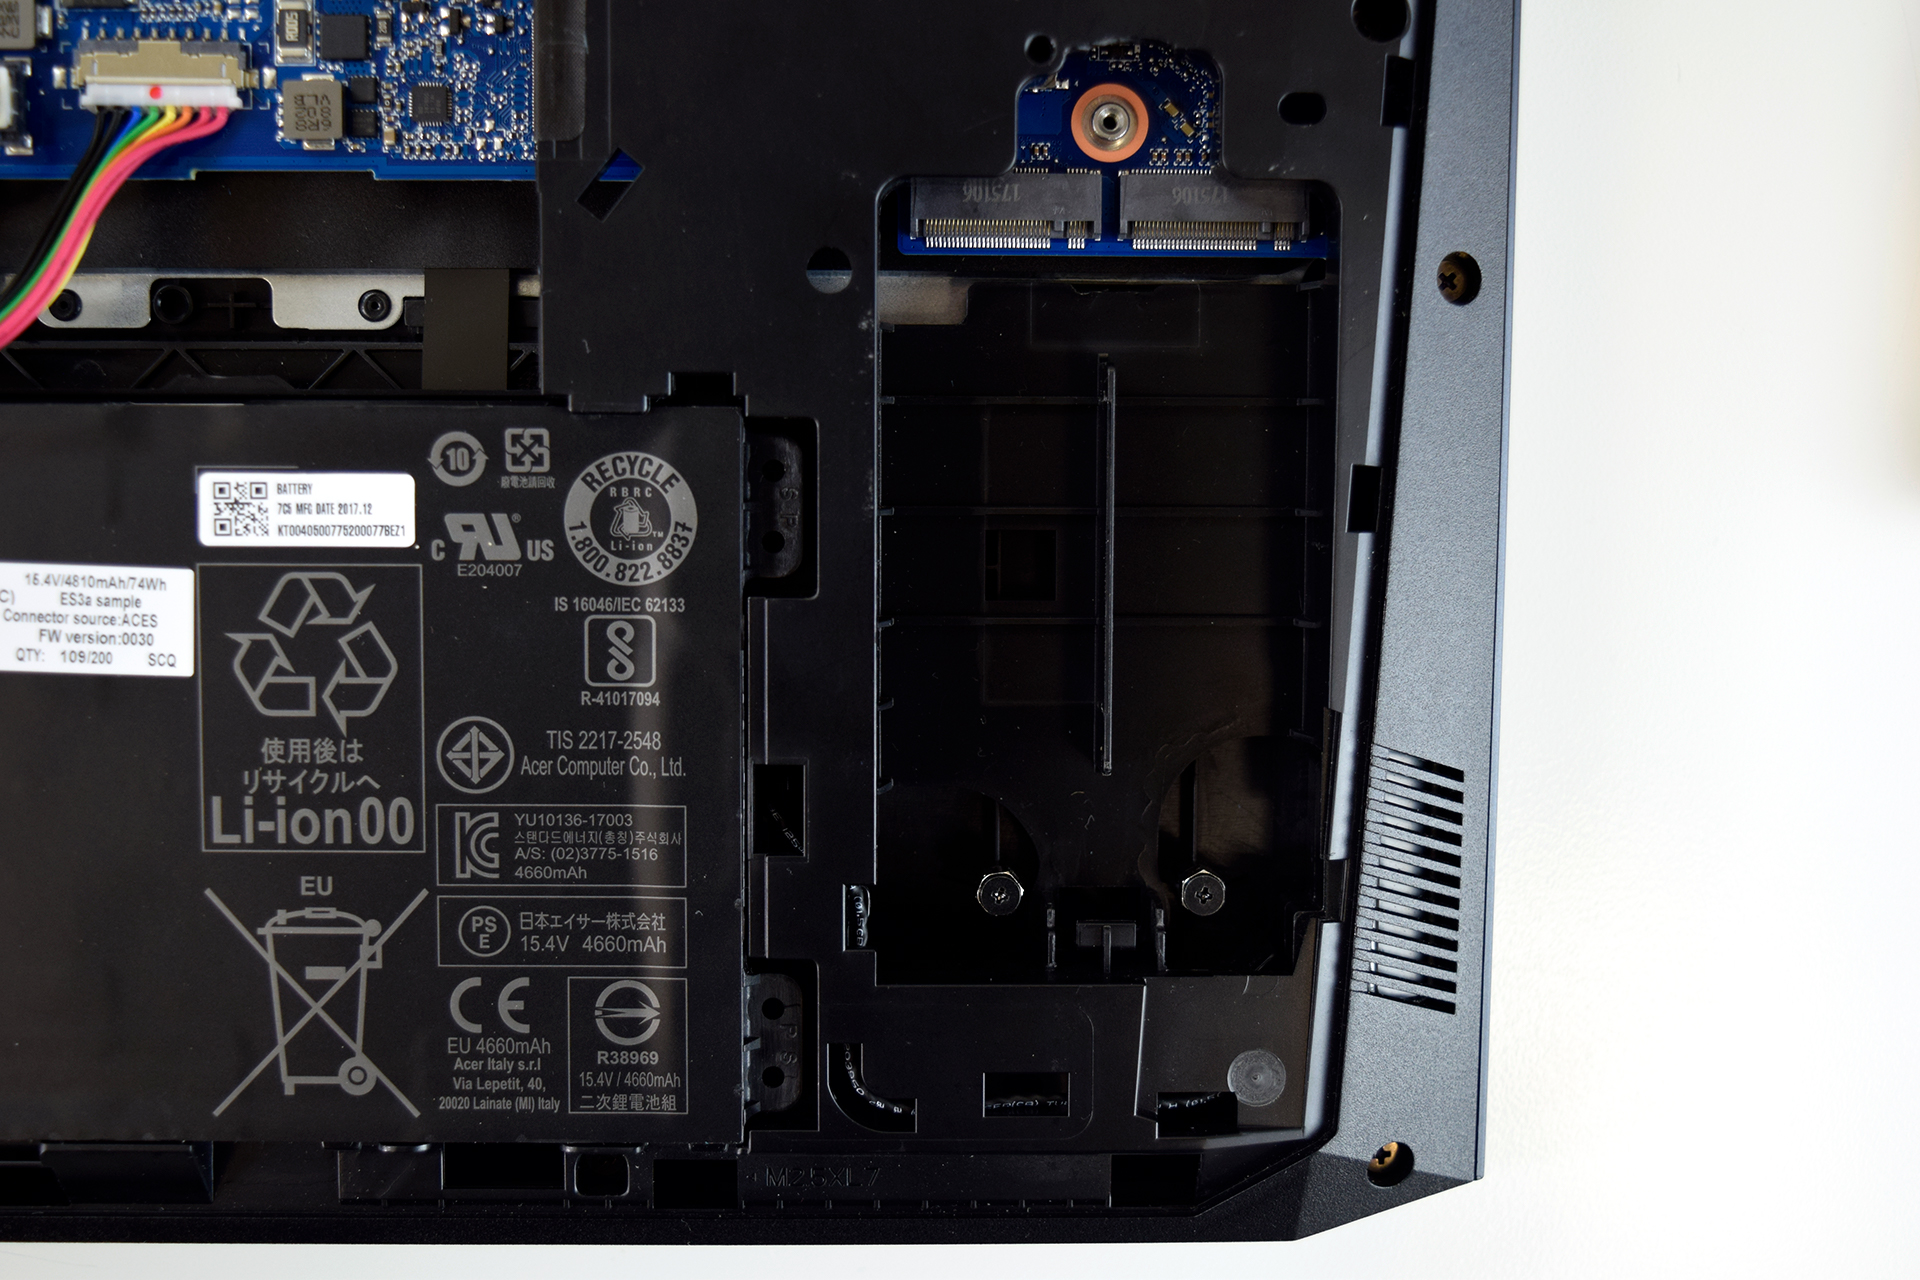 2x 2280 PCIe NVMe M 2 slot RAID 0 support